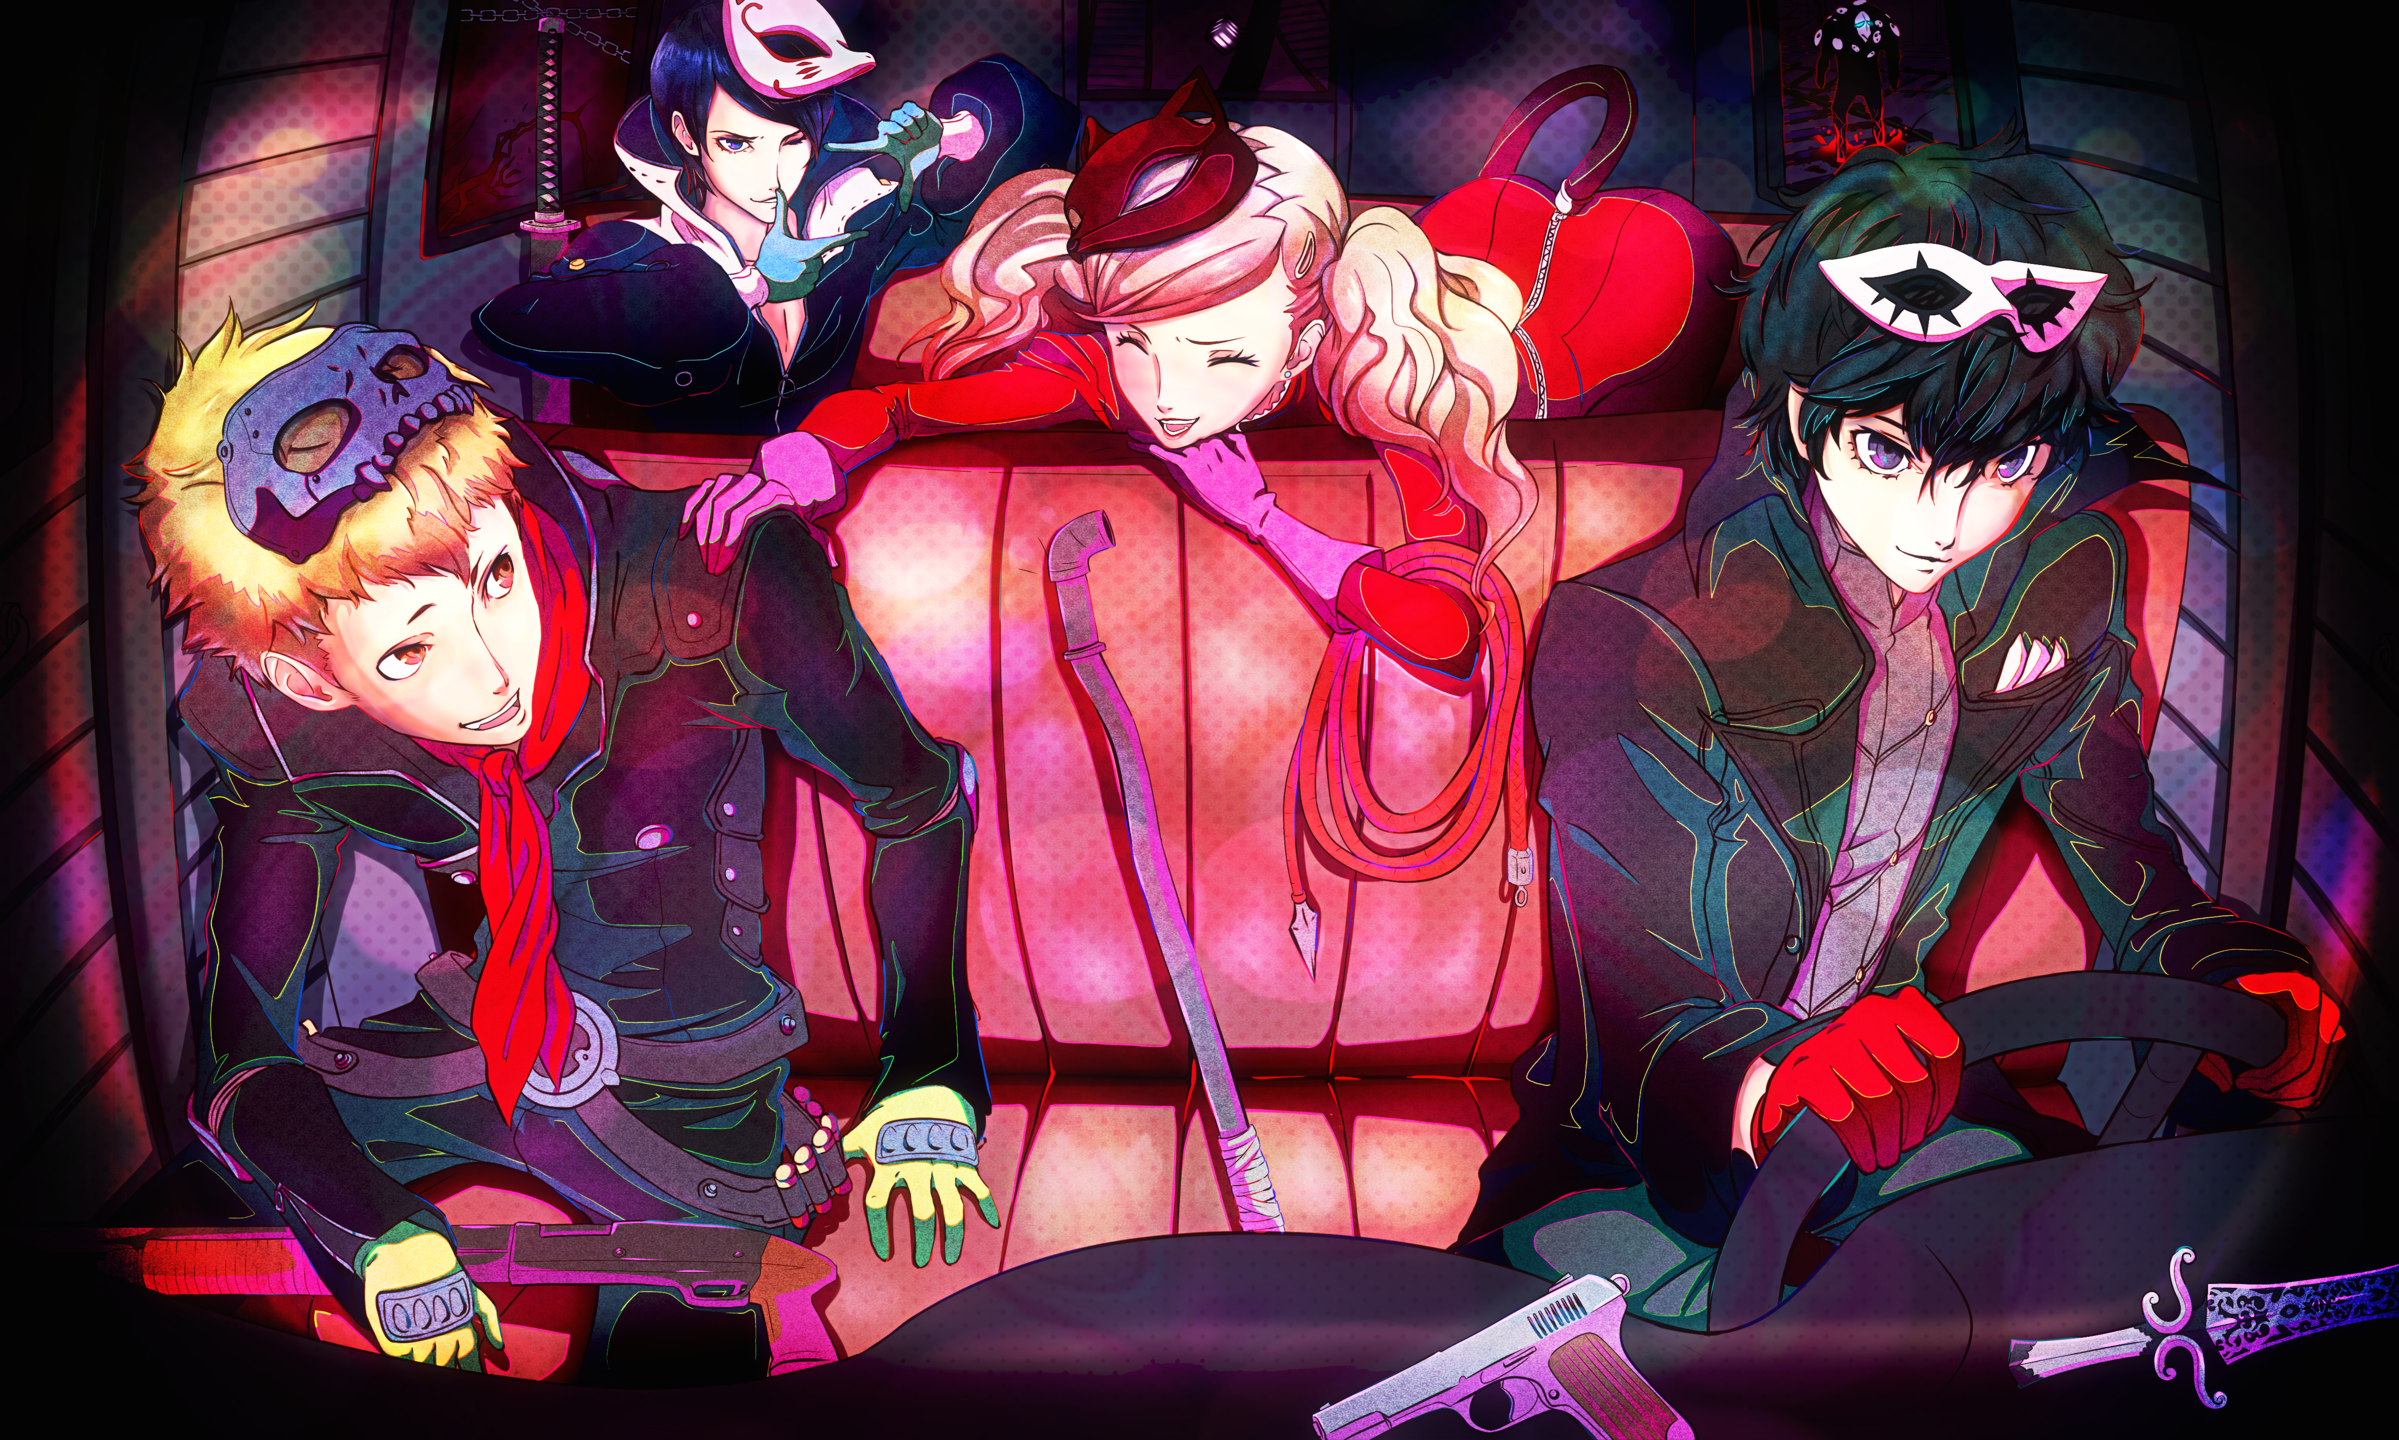 Persona 5 Tous Les Wallpaper HD Des All Out Attacks Jeux